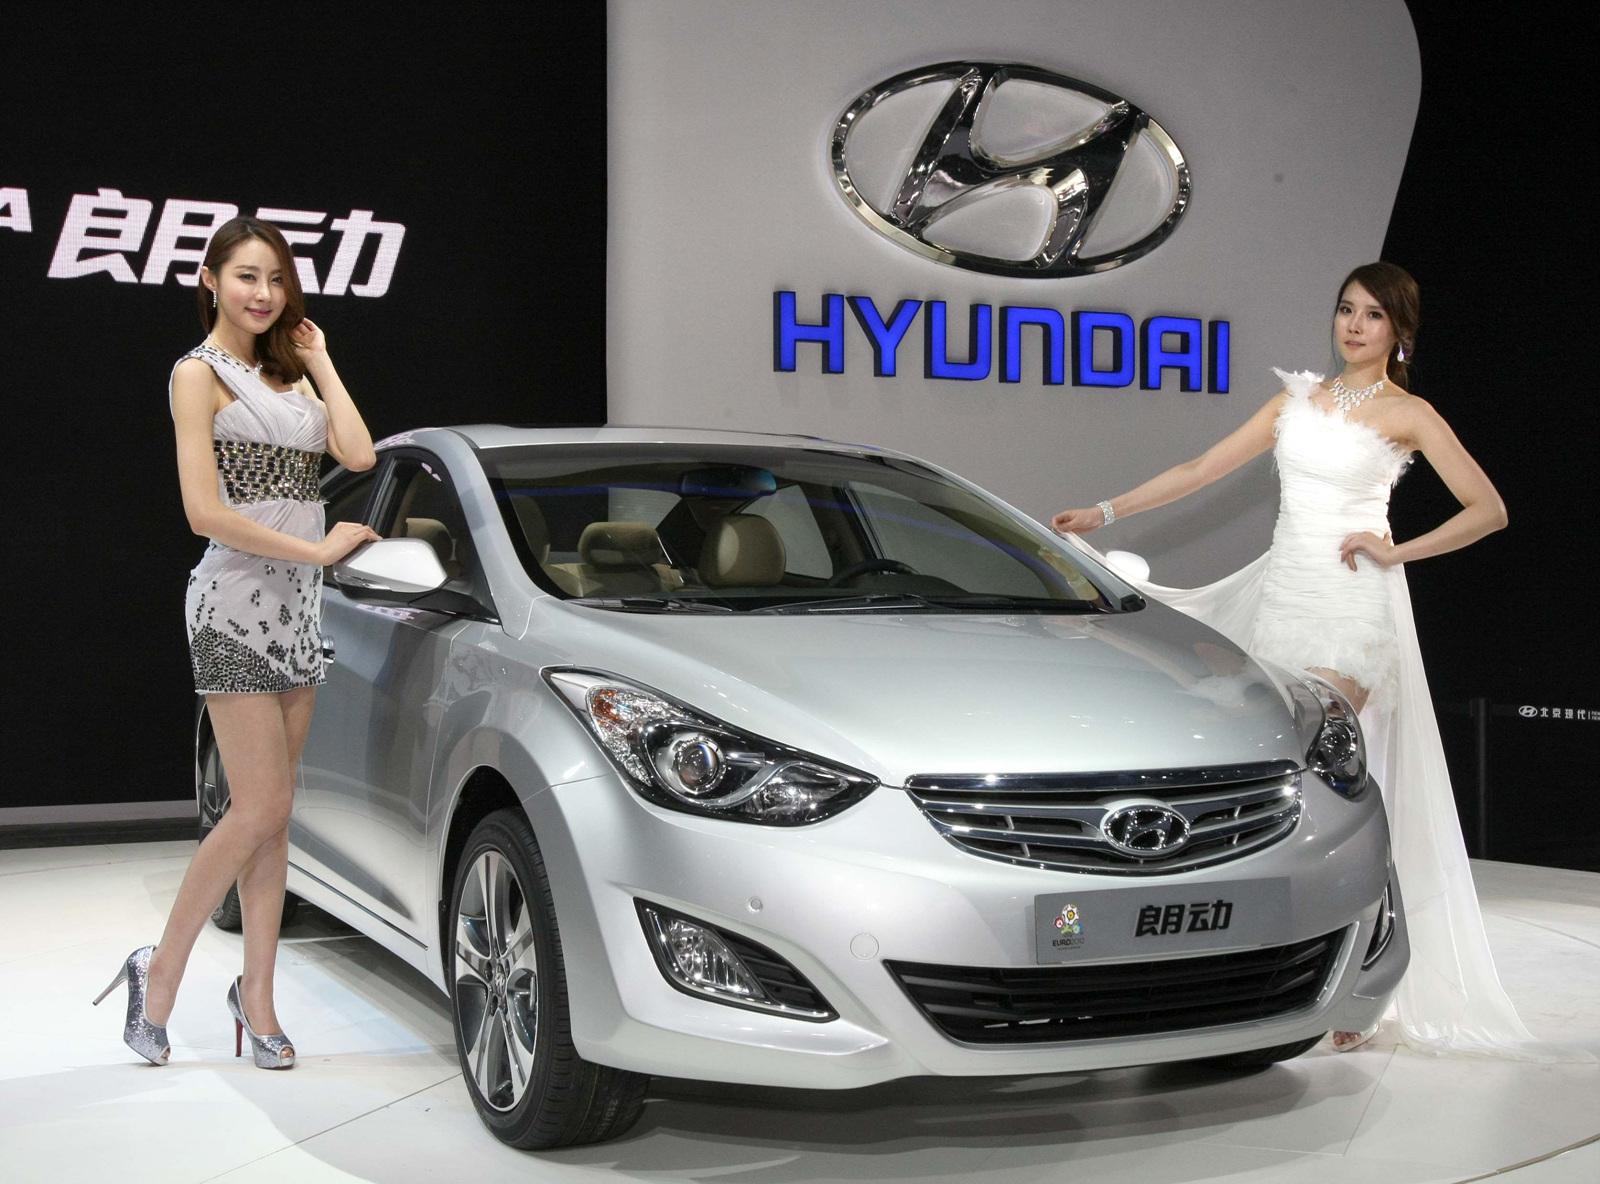 hyundai langdong 2012 beijing motor show 2 hyundai motor company. Black Bedroom Furniture Sets. Home Design Ideas